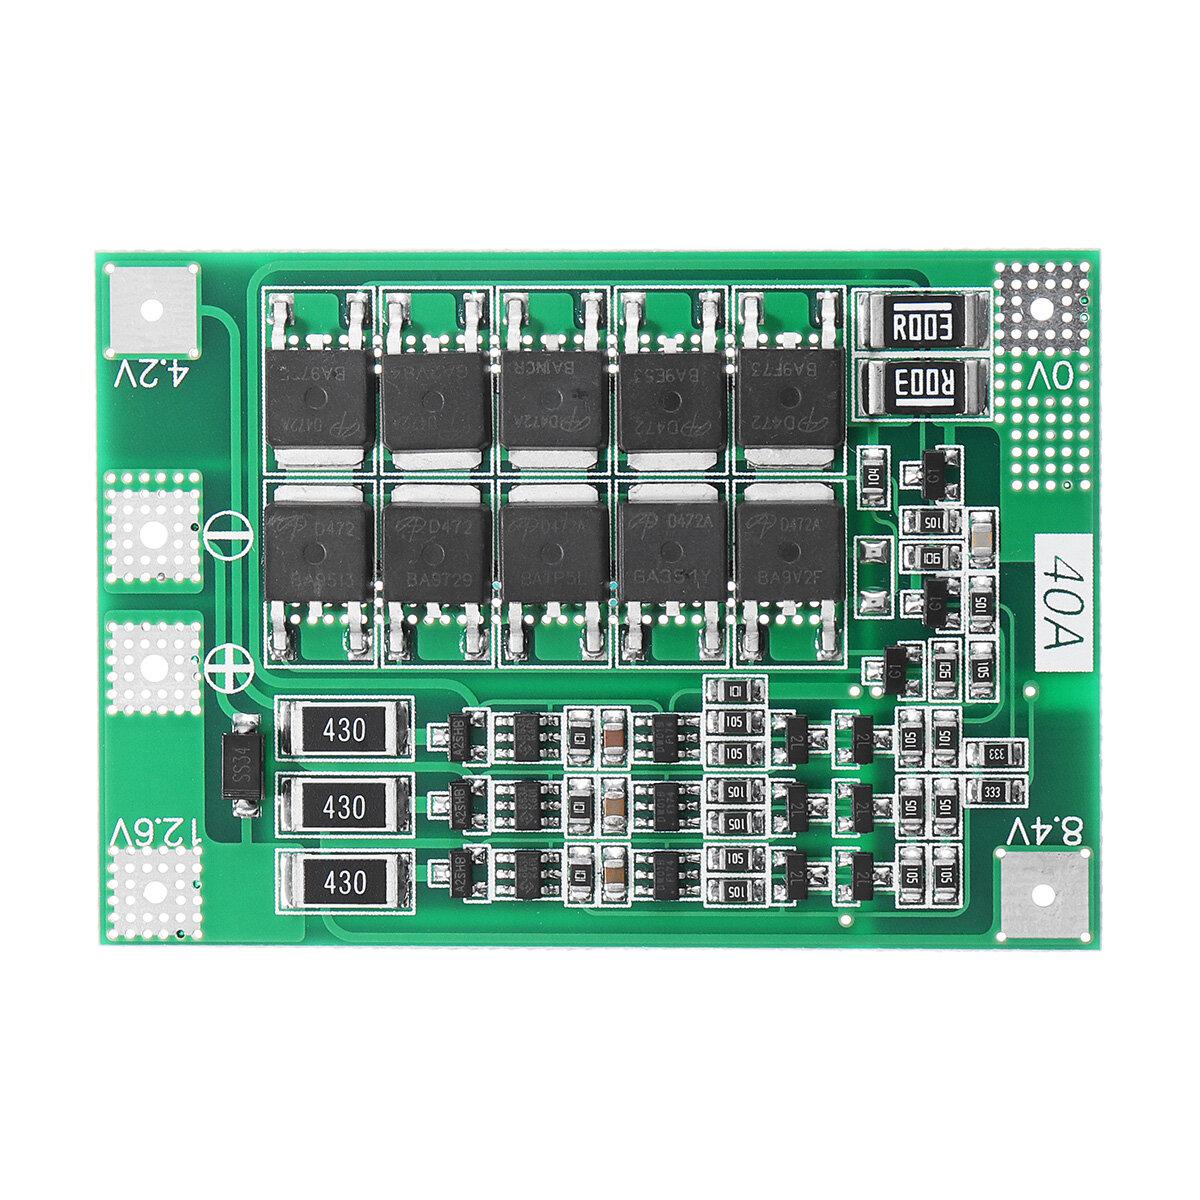 3S 40A Li-ion Litio Batería Placa de protección del cargador PCB BMS Para Taladro motor 11.1 V 12.6 V Módulo de célula lipo con equilibrio